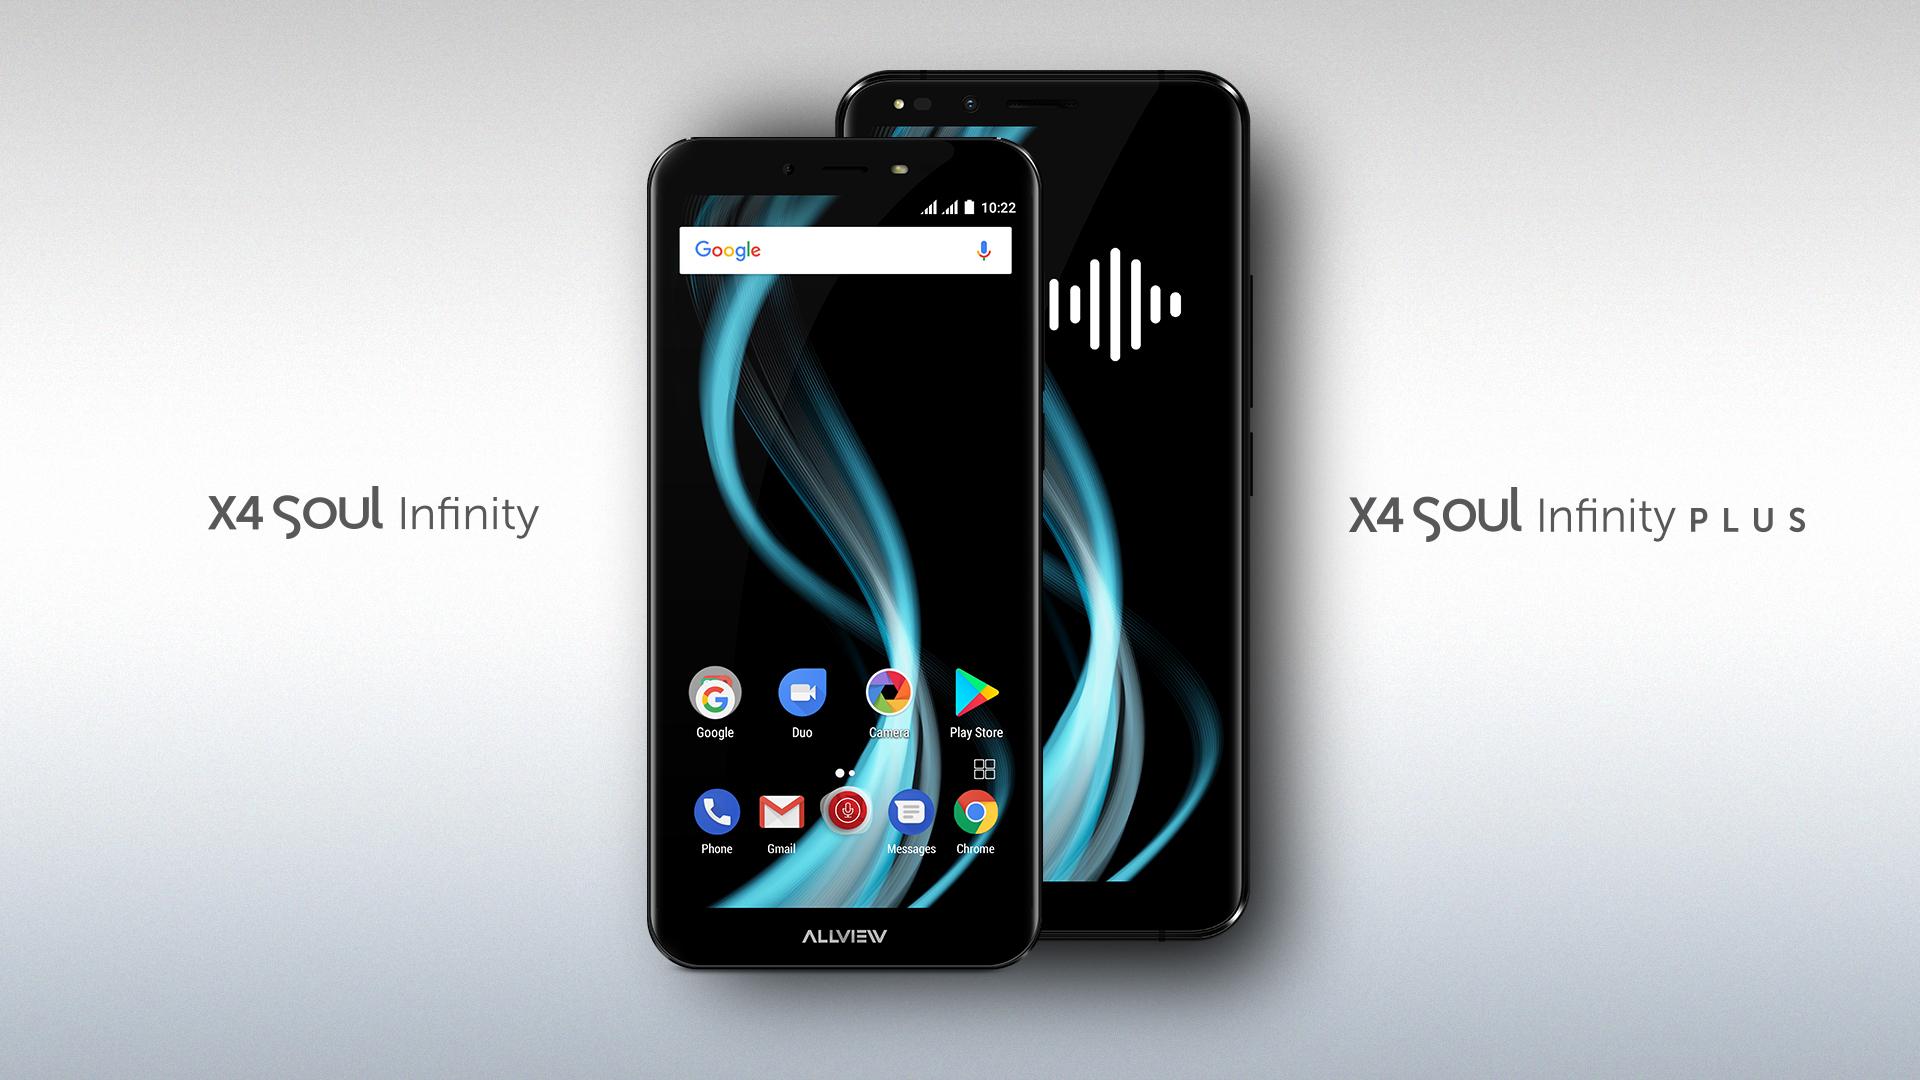 X4 Soul Infinity Plus